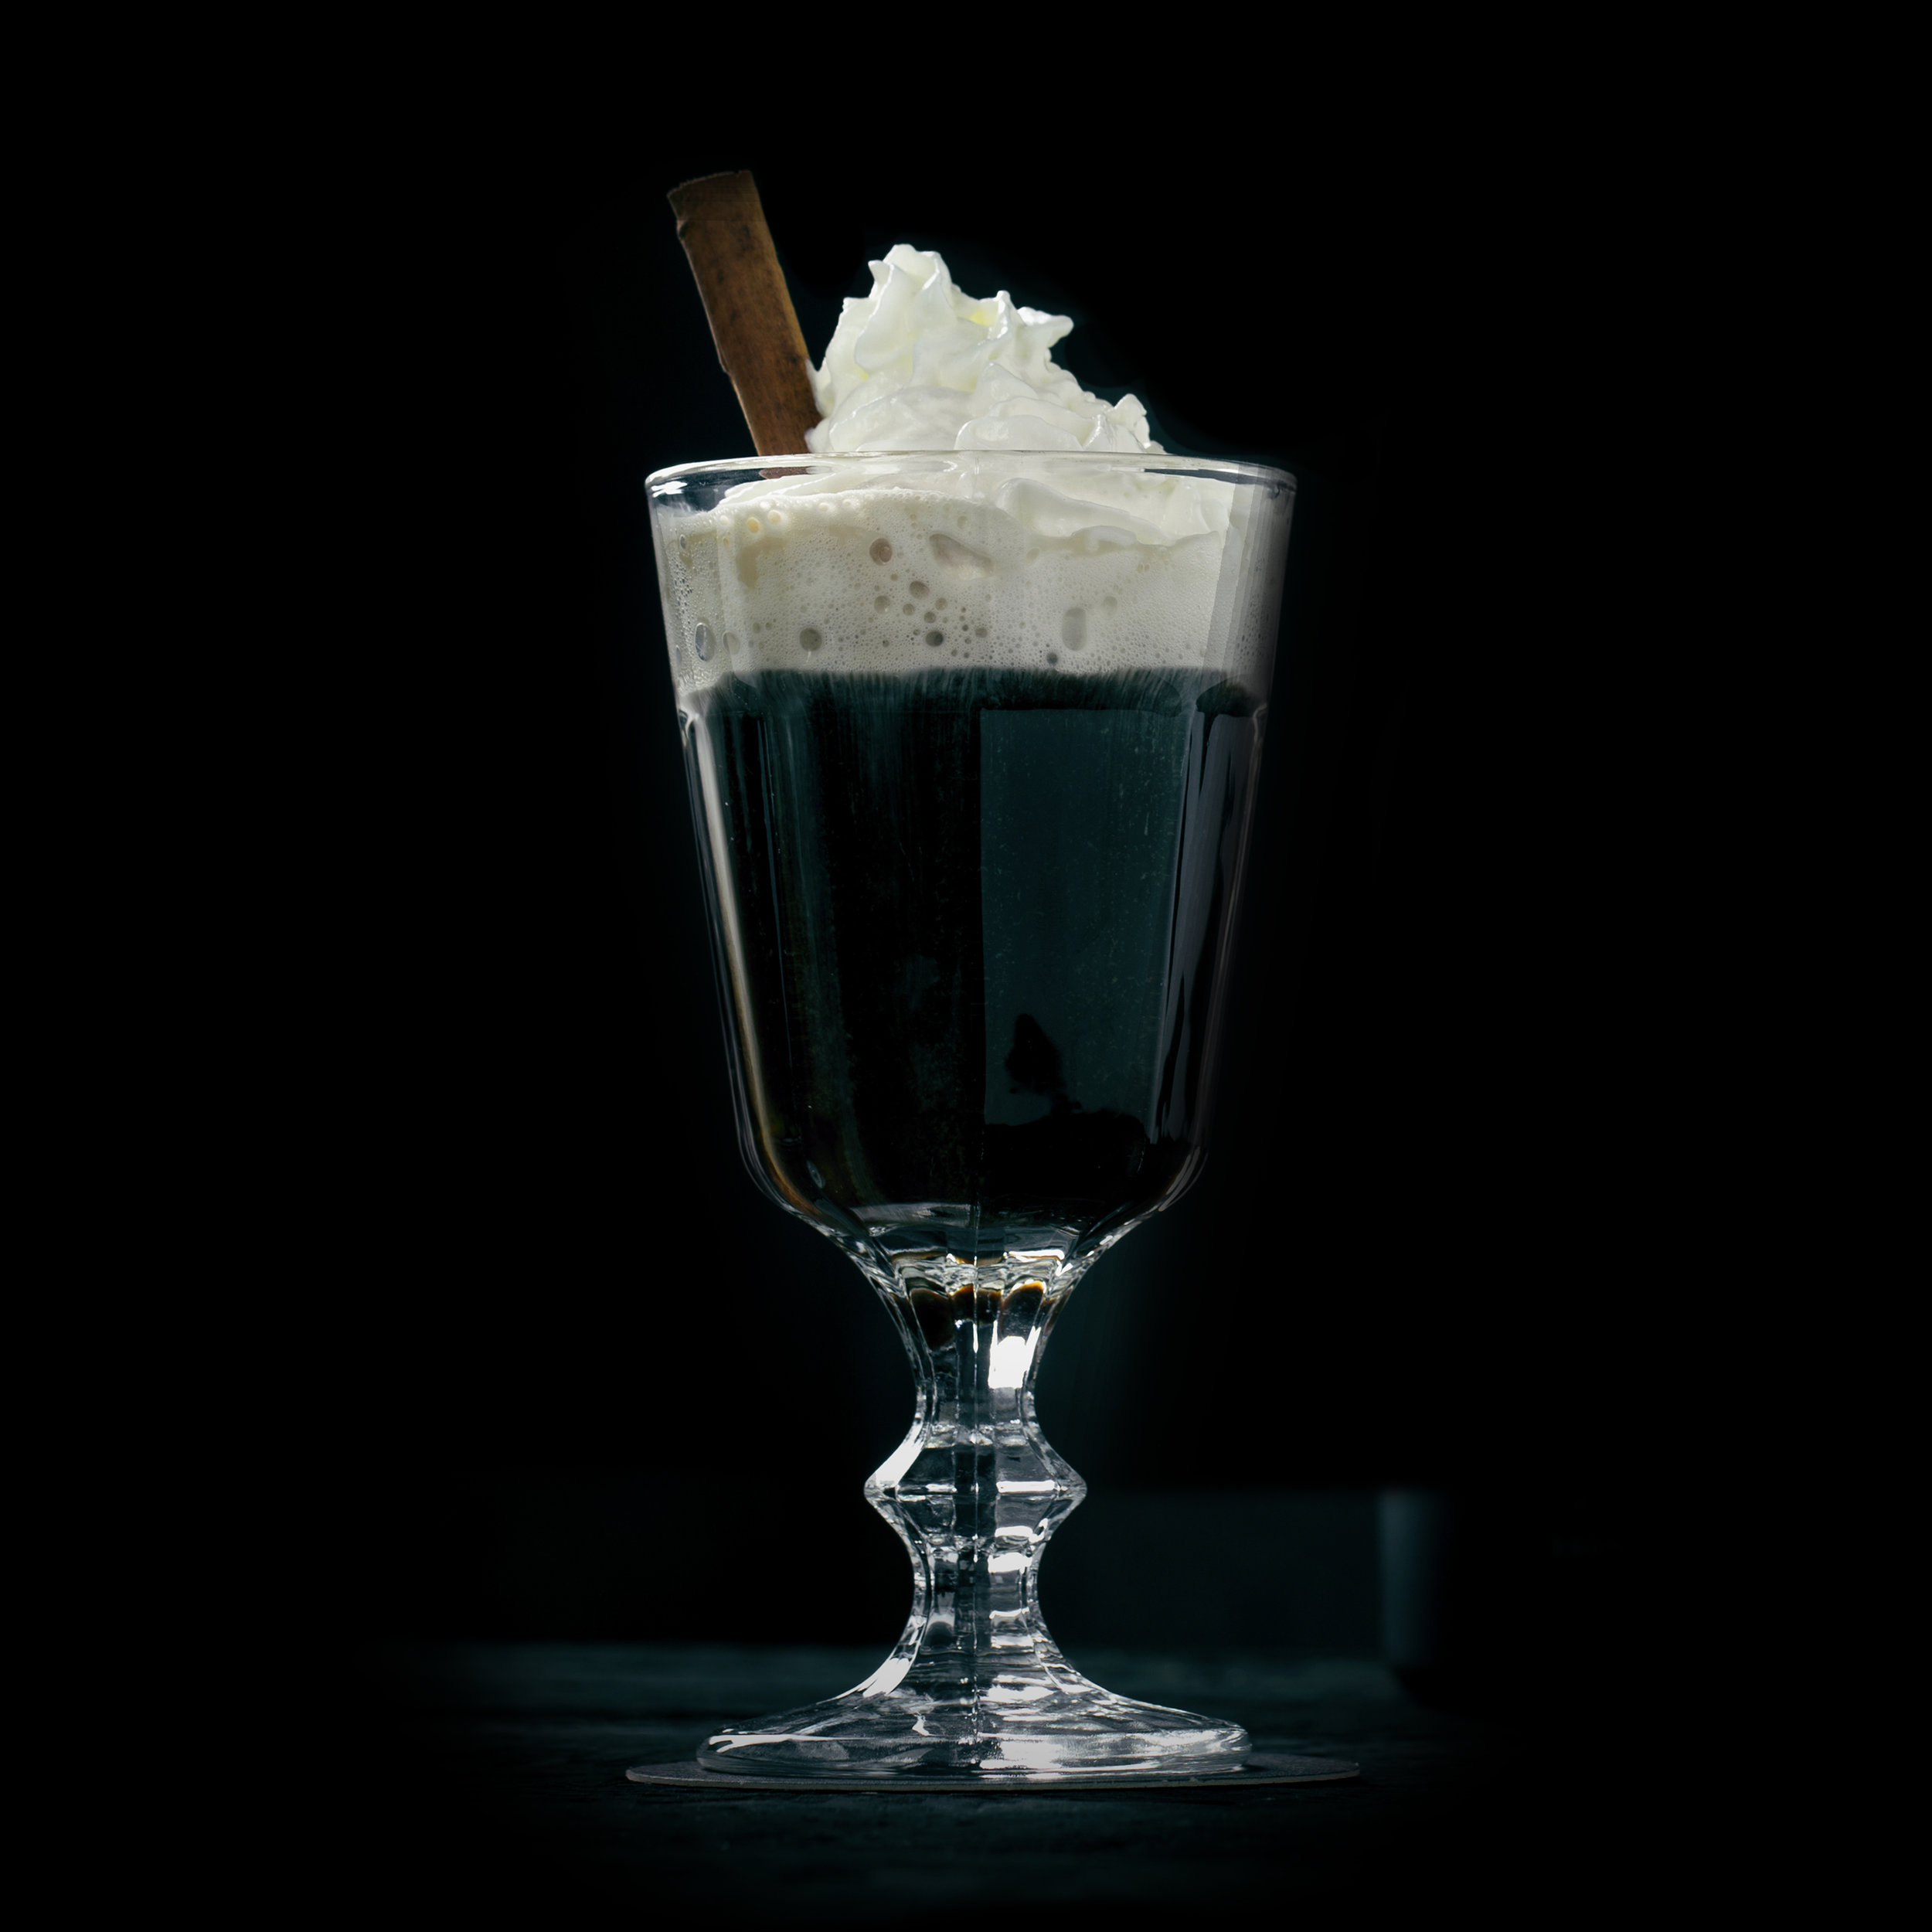 CAFE NOIR  INGREDIENTS  - 2 oz. El Silencio Espadin  - 1 oz. Galliano Ristretto  - 1 Double Shot Espresso (2 oz.)  METHOD  Stir with Cinnamon Stick & Vanilla Bean -Serve in a latte cup or your favorite coffee mug